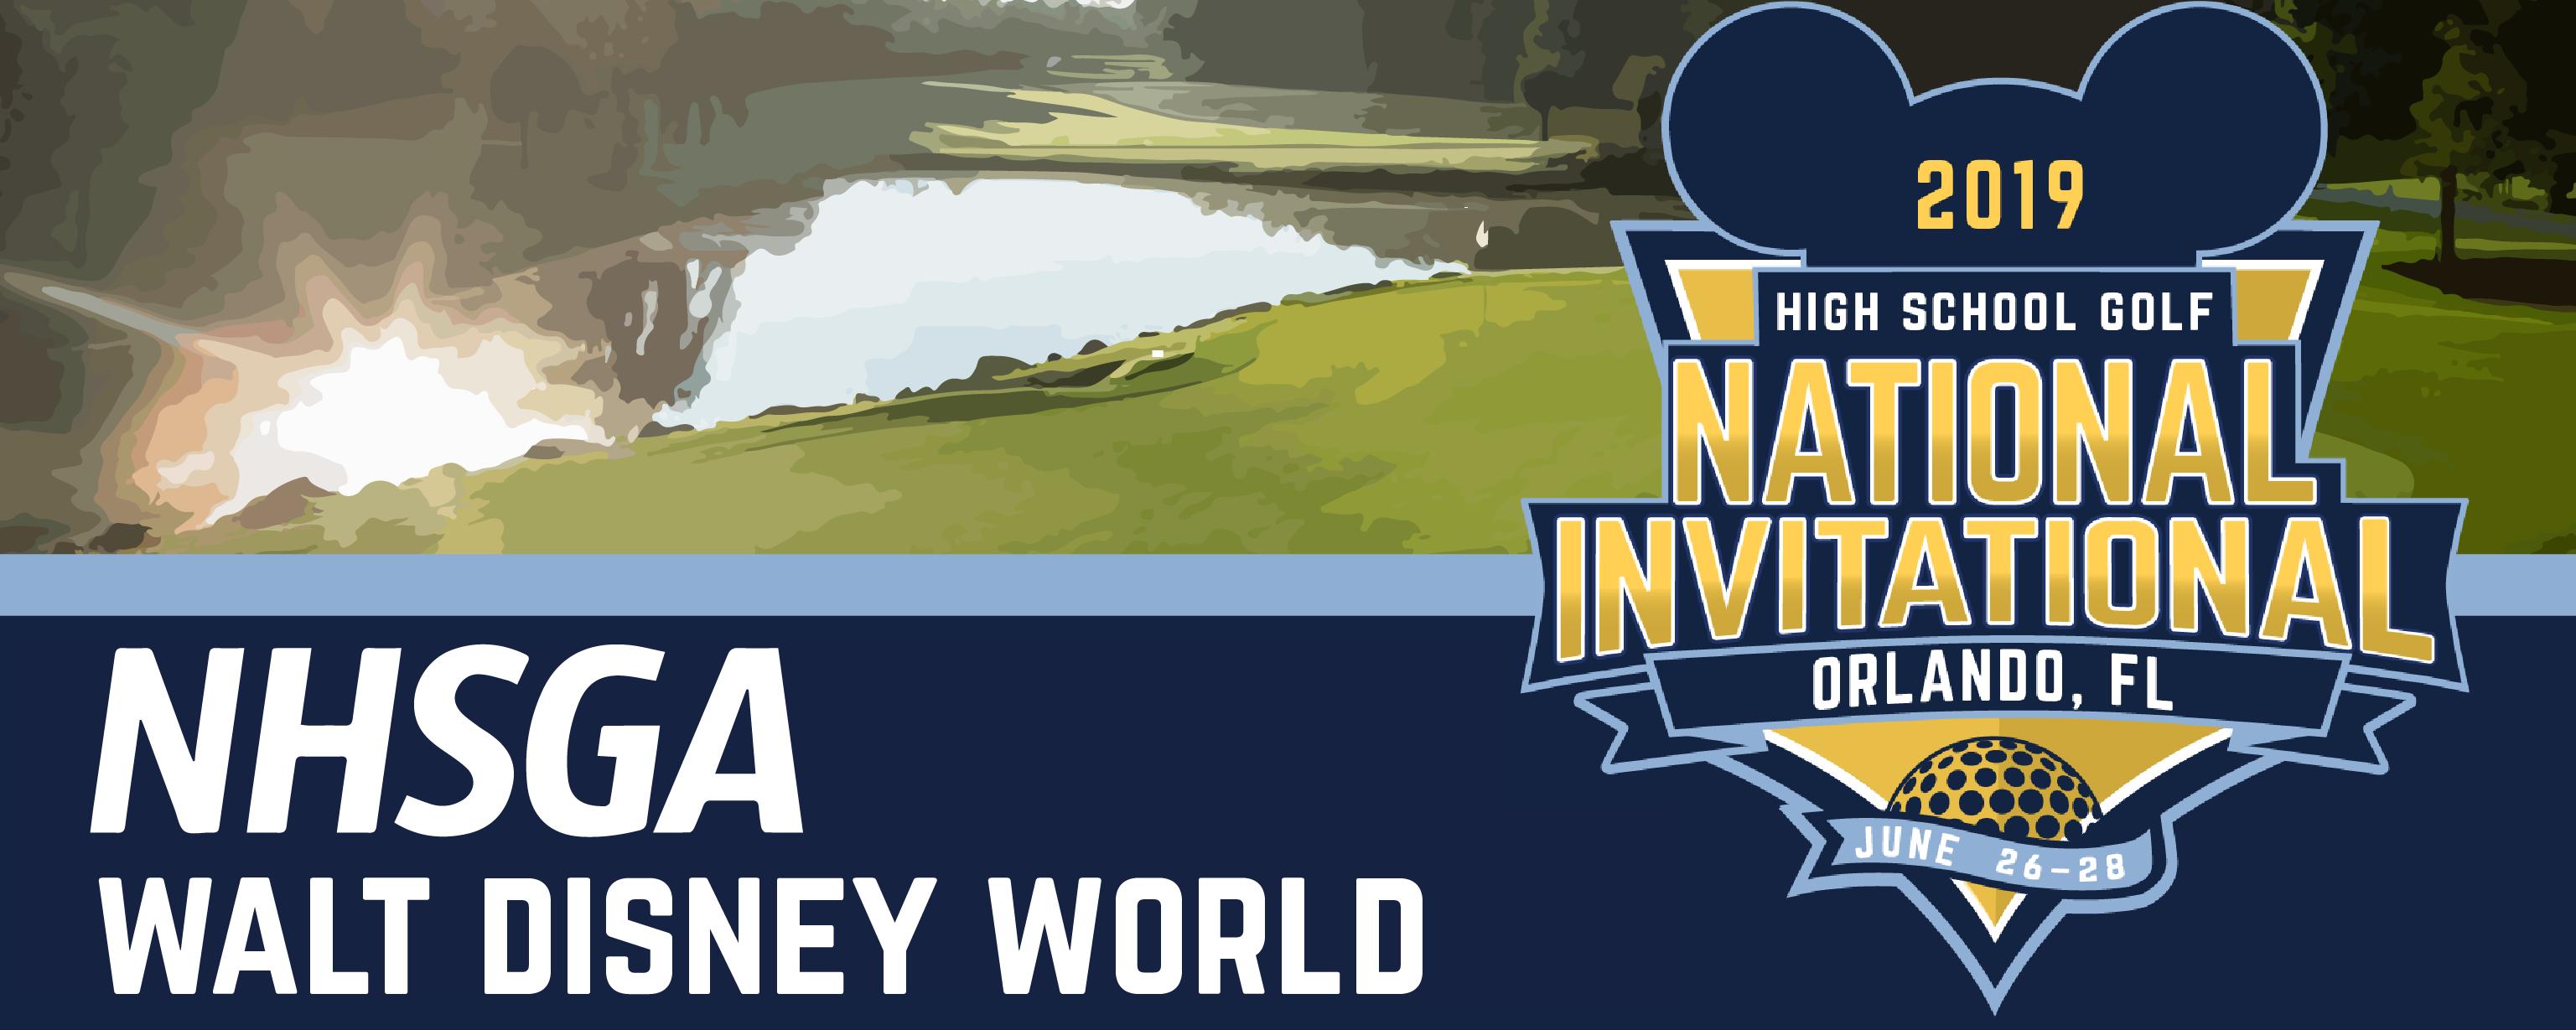 2019 High School Golf National Invitational